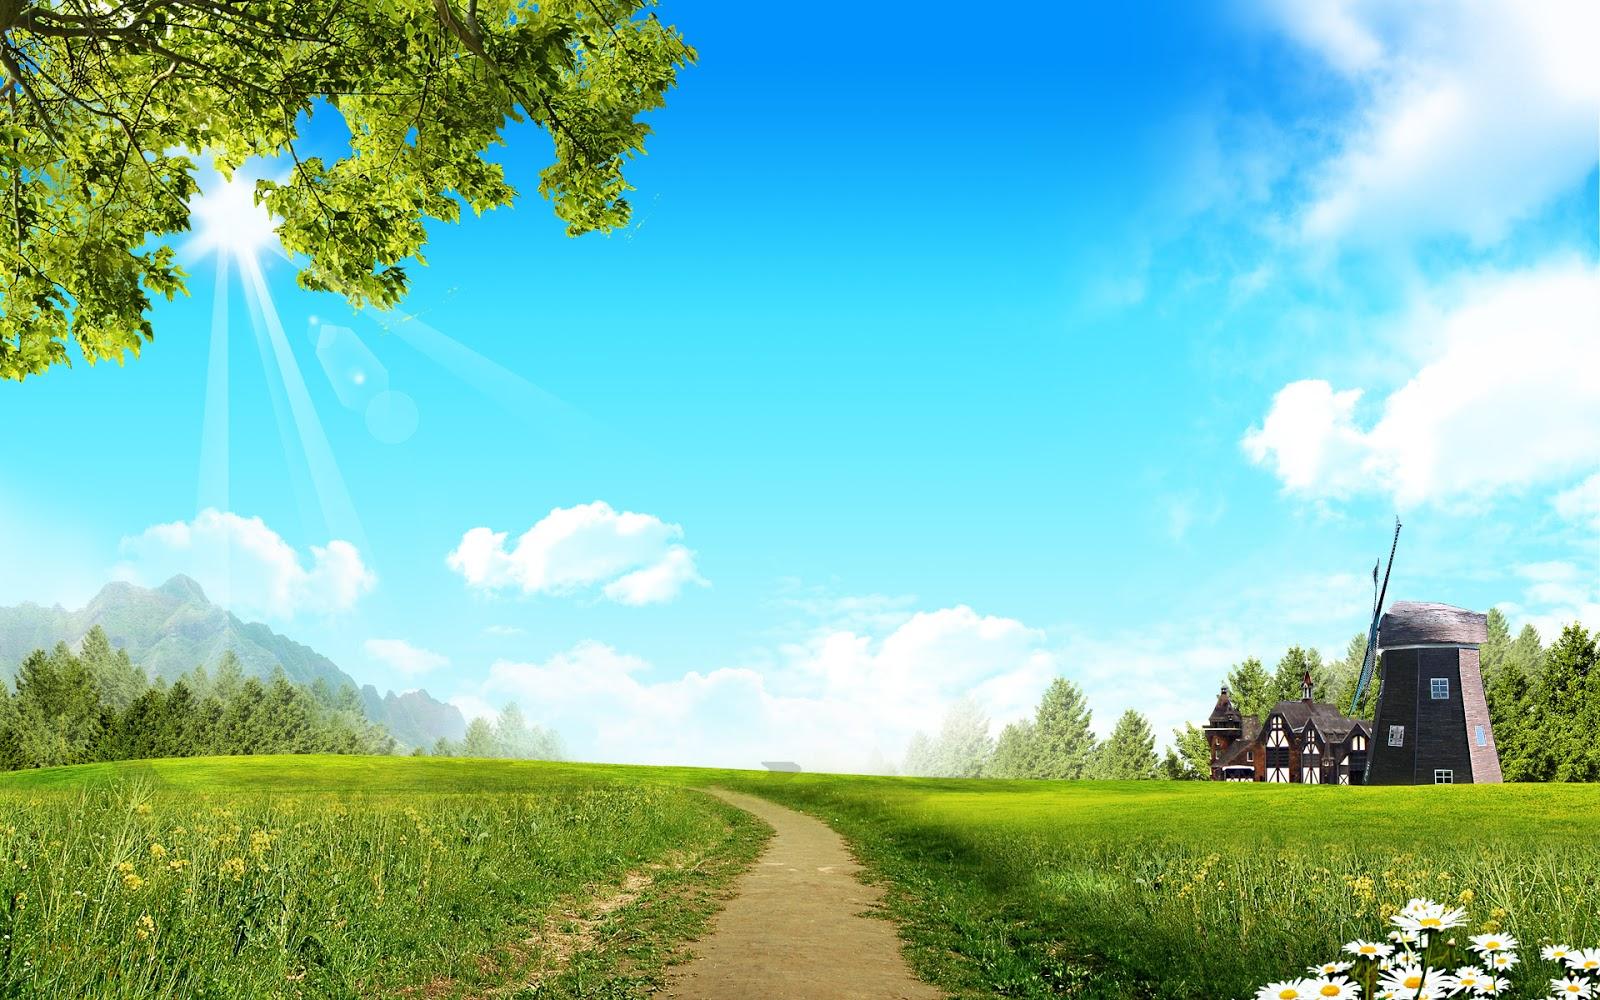 http://4.bp.blogspot.com/-VBrCXKHyZZg/UQIrds2iT_I/AAAAAAAADYI/iRZSrSsanZU/s1600/free+hd+desktop+wallpaper+beautiful+village.jpg